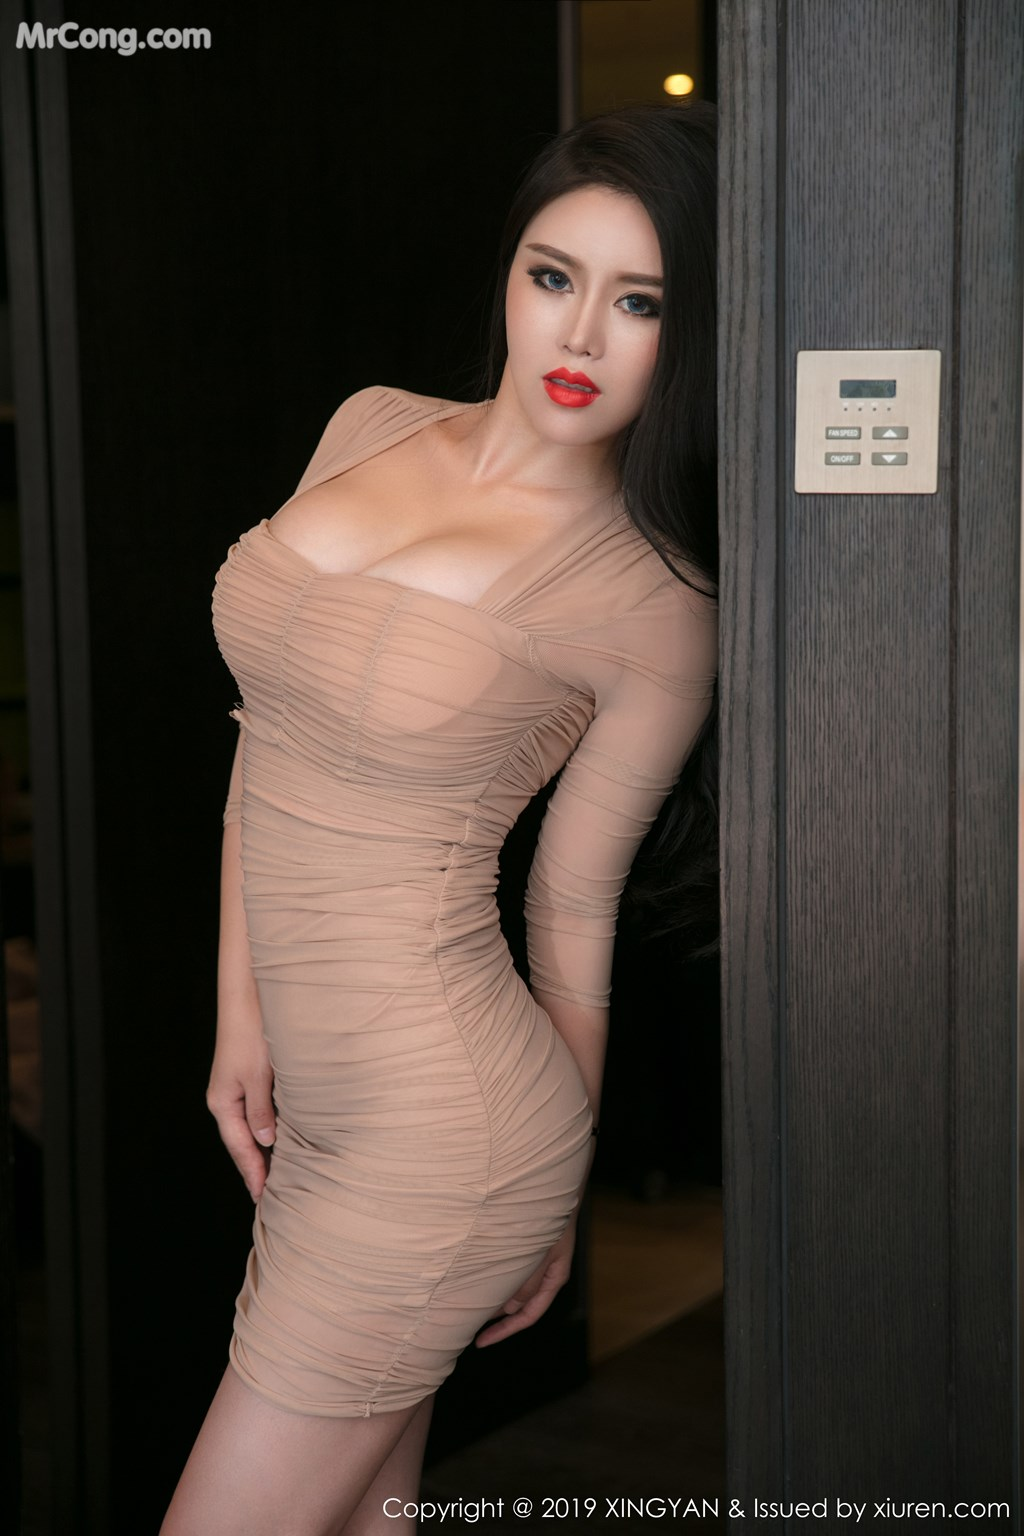 Image XingYan-Vol.111-Ke-Rui-Na-MrCong.com-021 in post XingYan Vol.111: Người mẫu Ke Rui Na (可蕊娜) (52 ảnh)